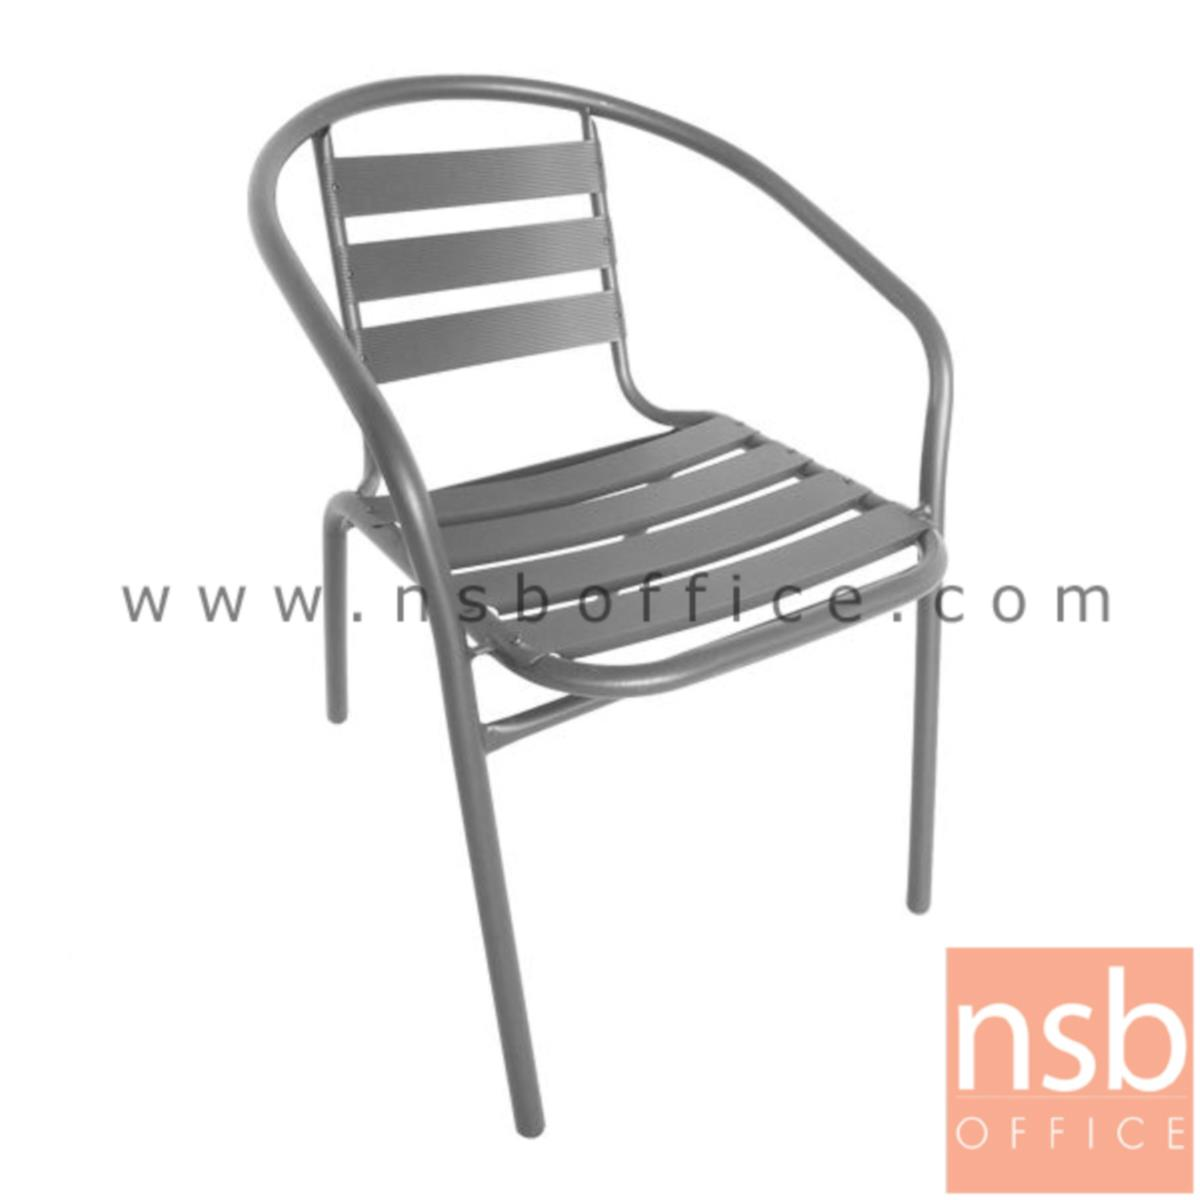 B08A055:เก้าอี้สนามโครงเหล็กพ่นเทา รุ่น Folklore (โฟล์กลอร์)